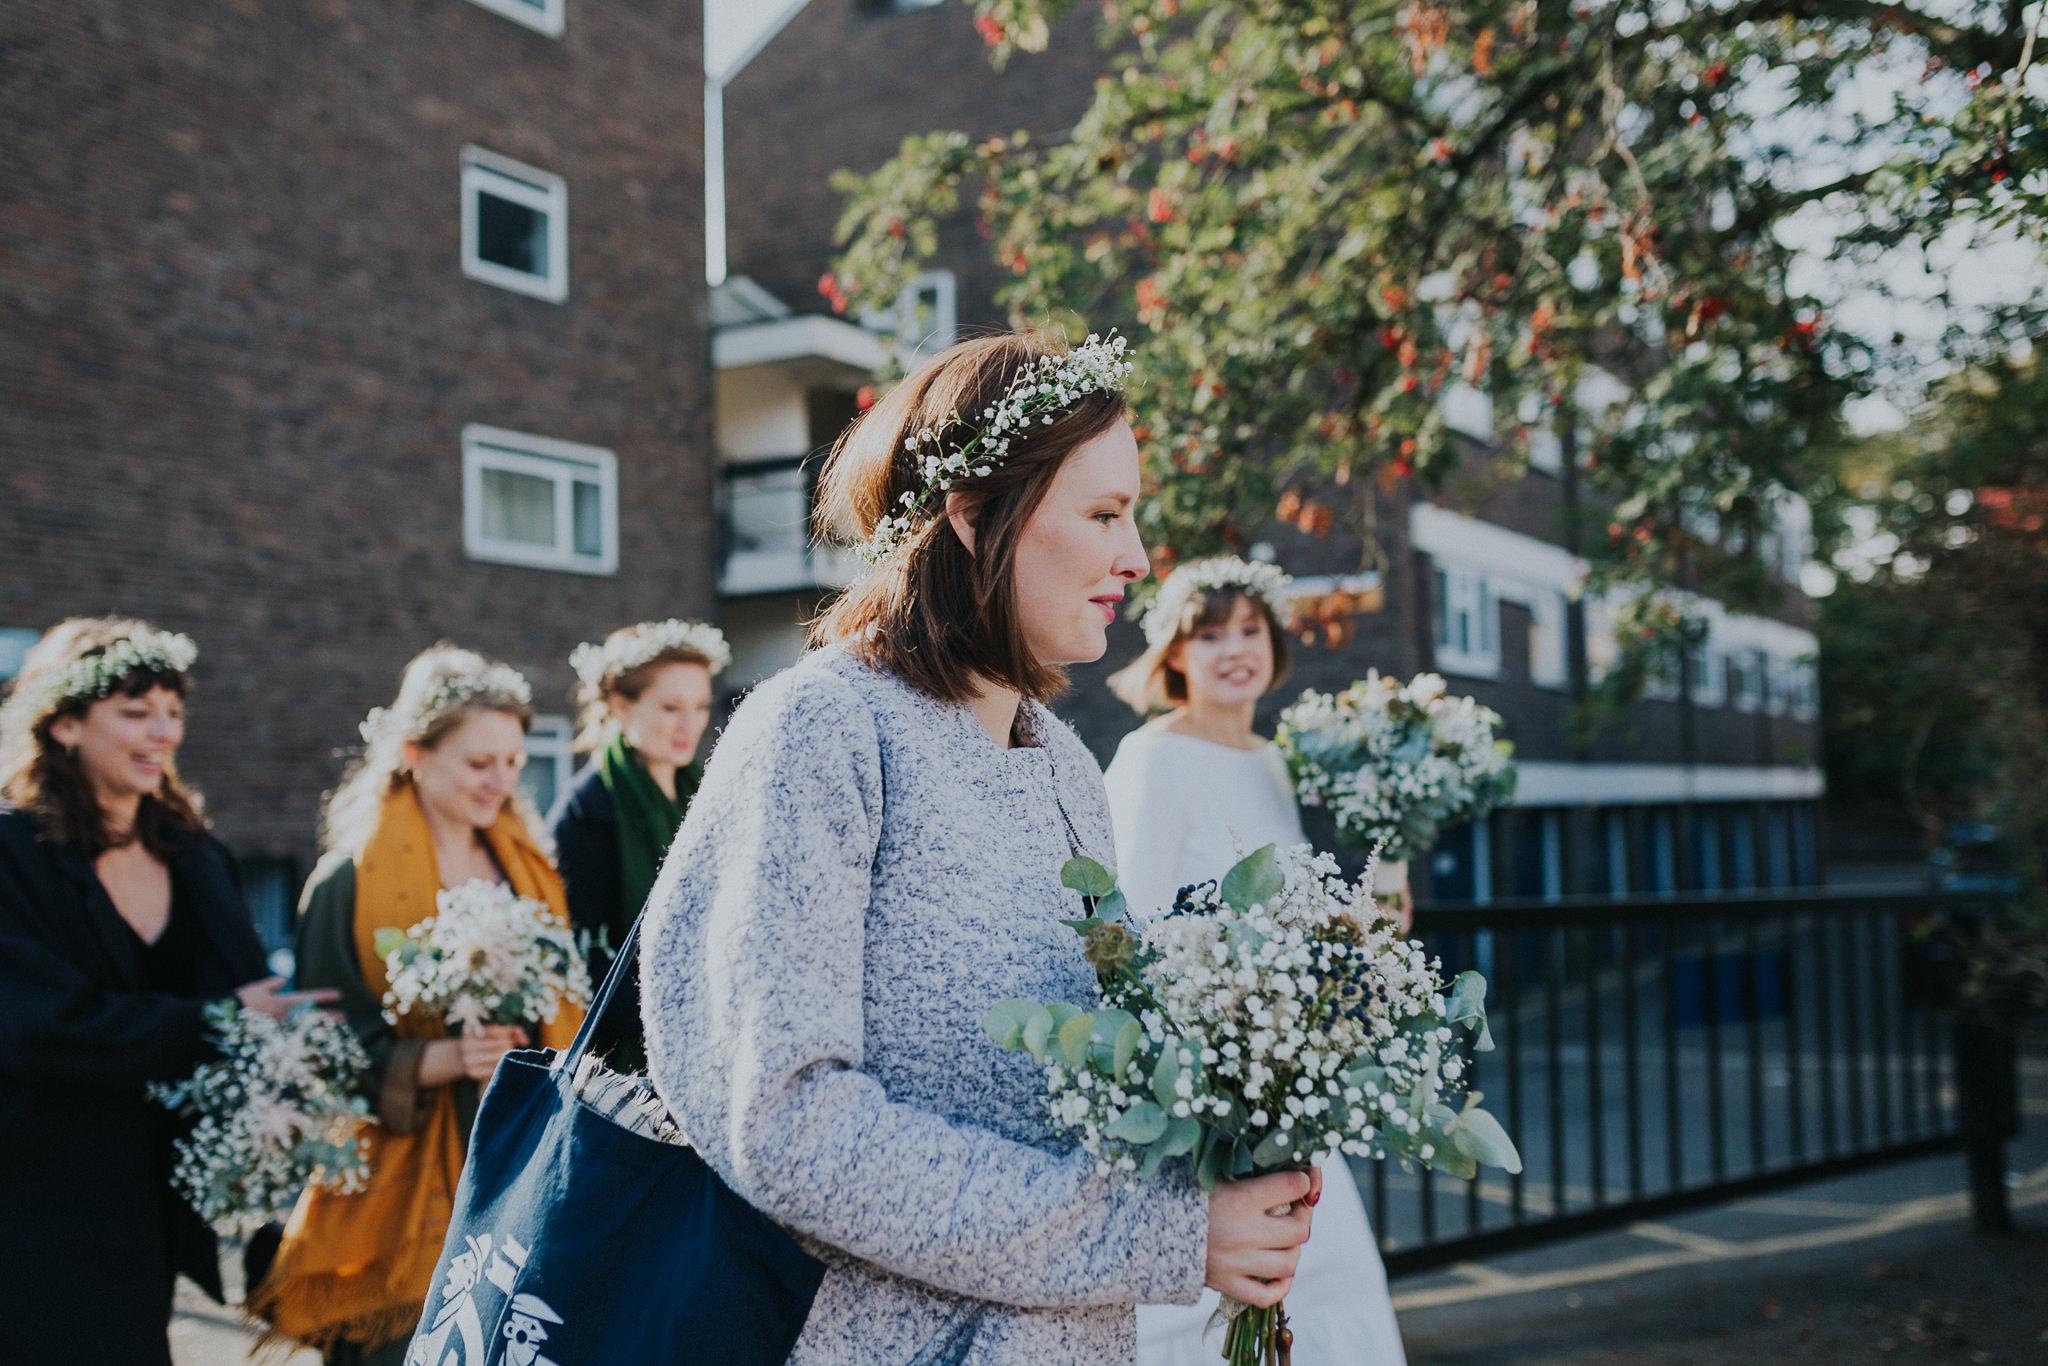 kate-gray-london-wedding-photography-15.jpg